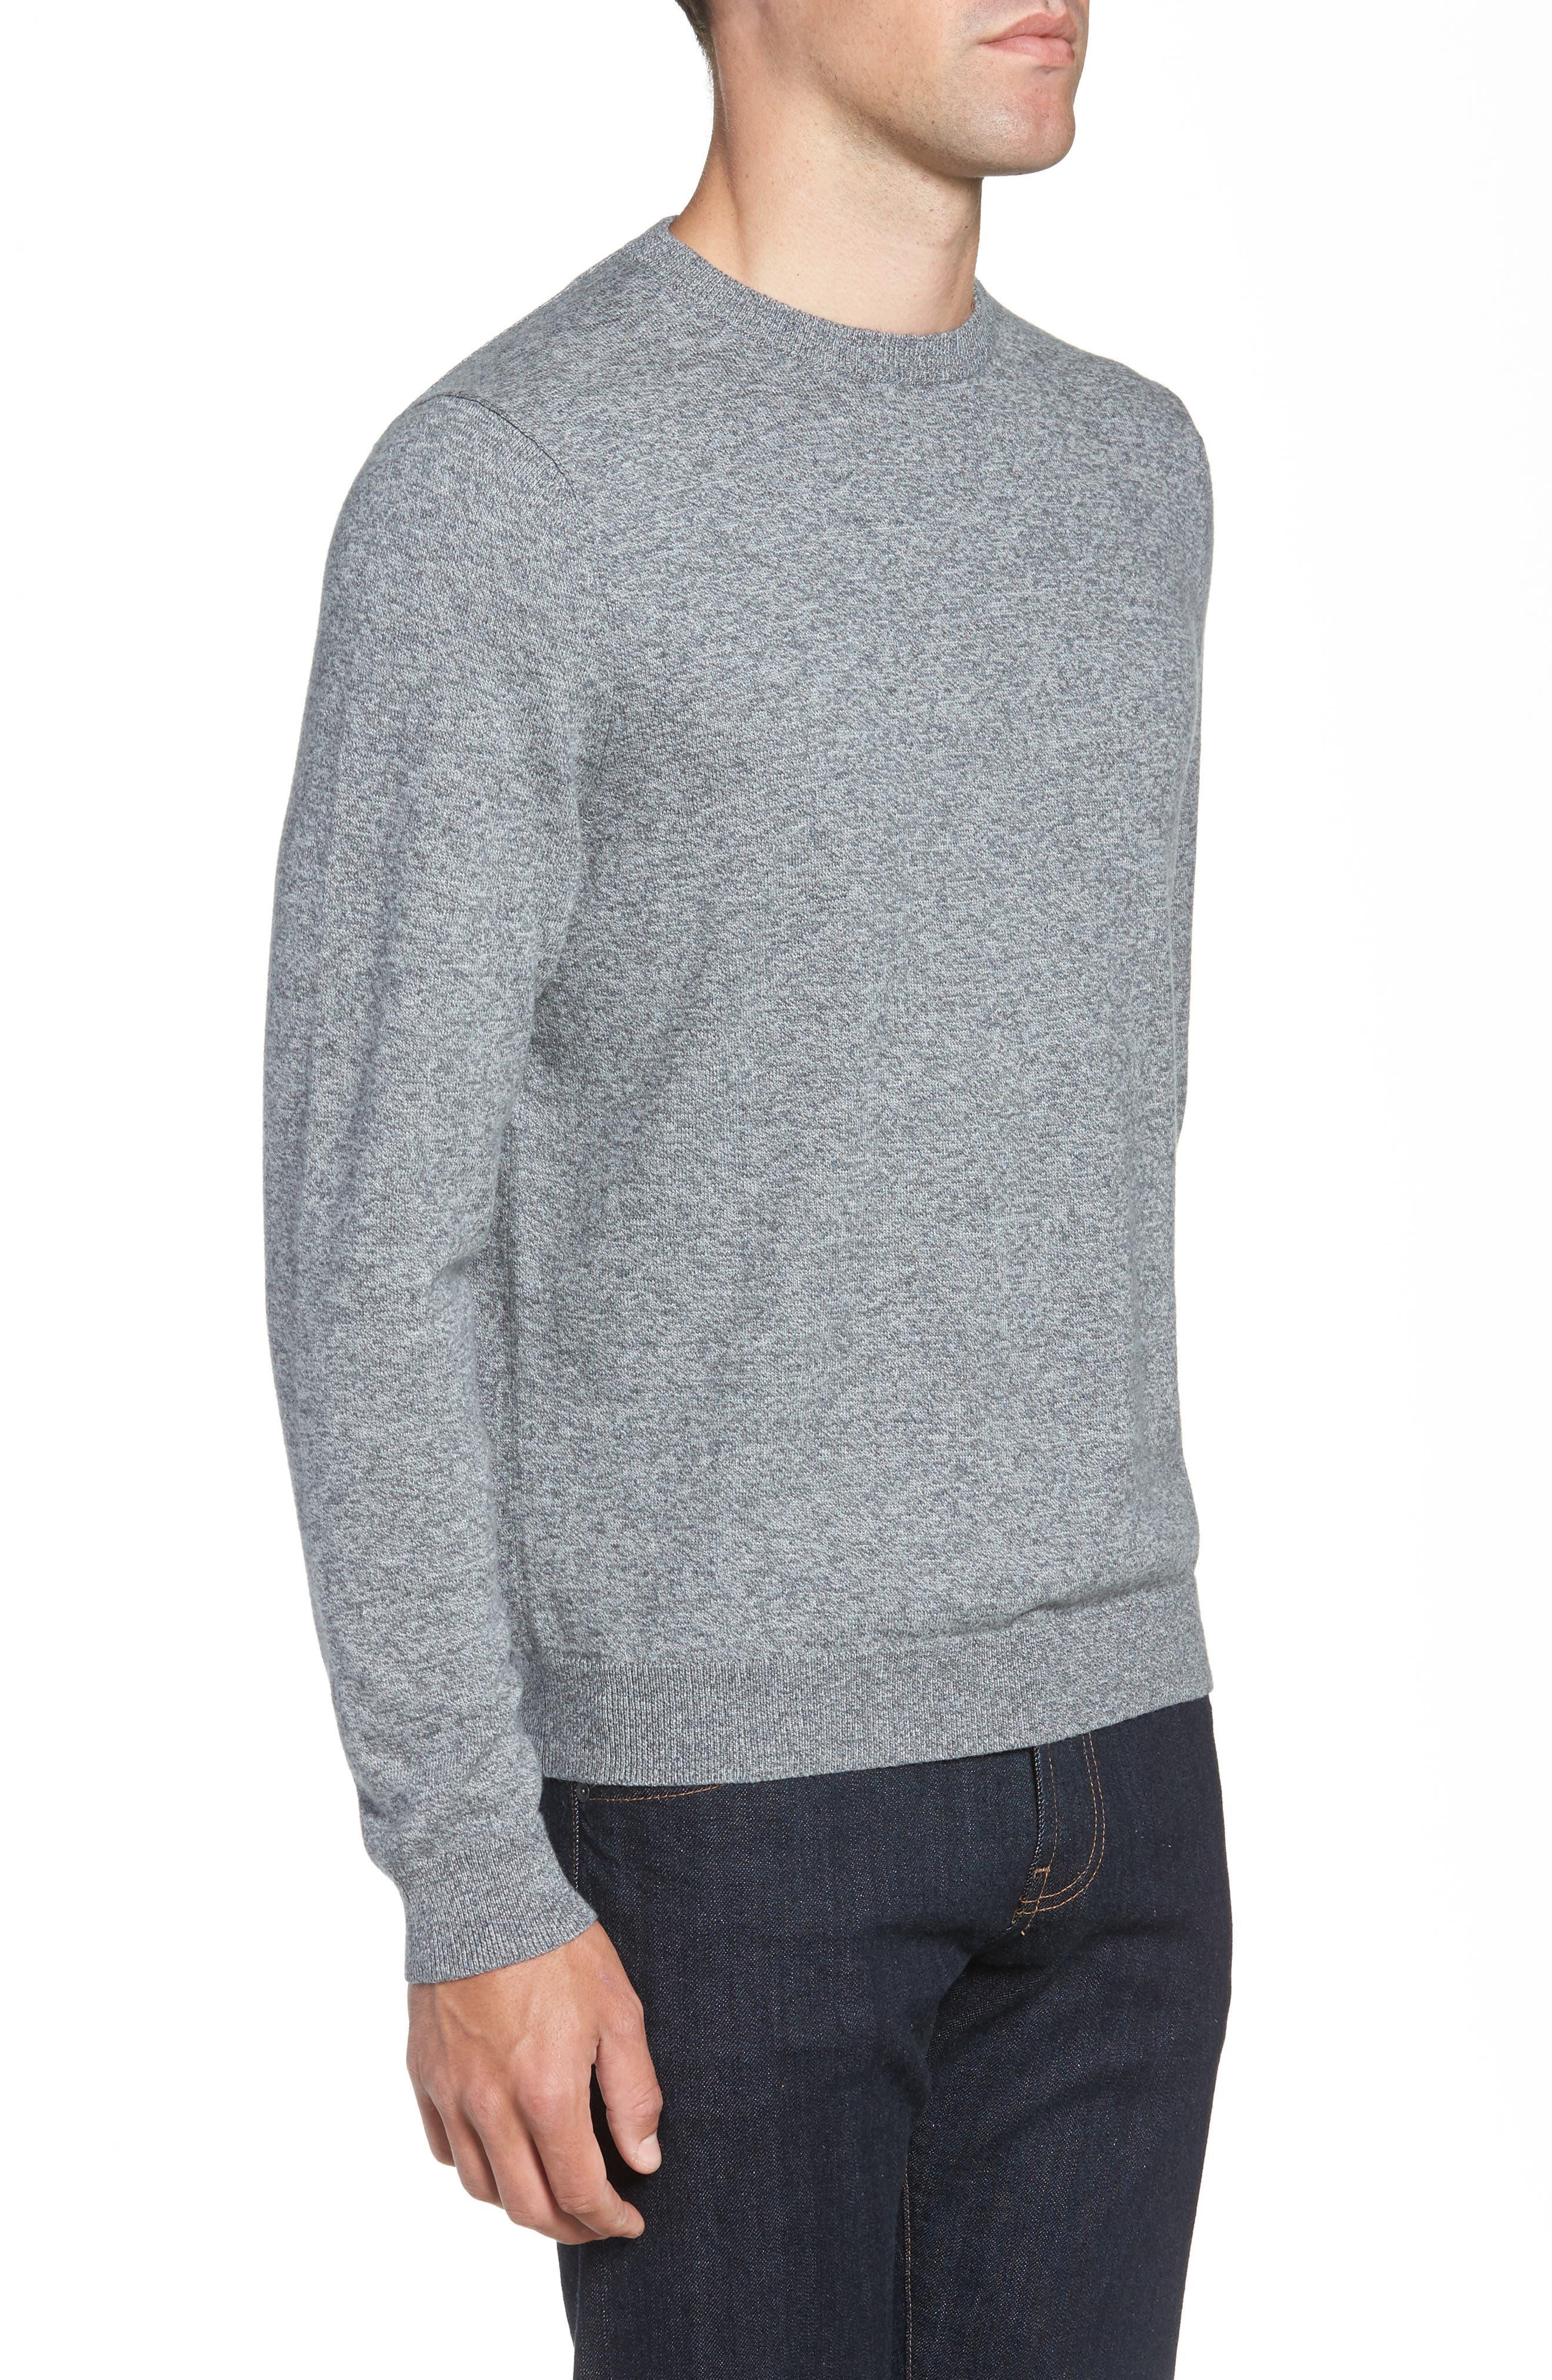 NORDSTROM MEN'S SHOP, Cotton & Cashmere Crewneck Sweater, Alternate thumbnail 3, color, GREY SHADE MARL